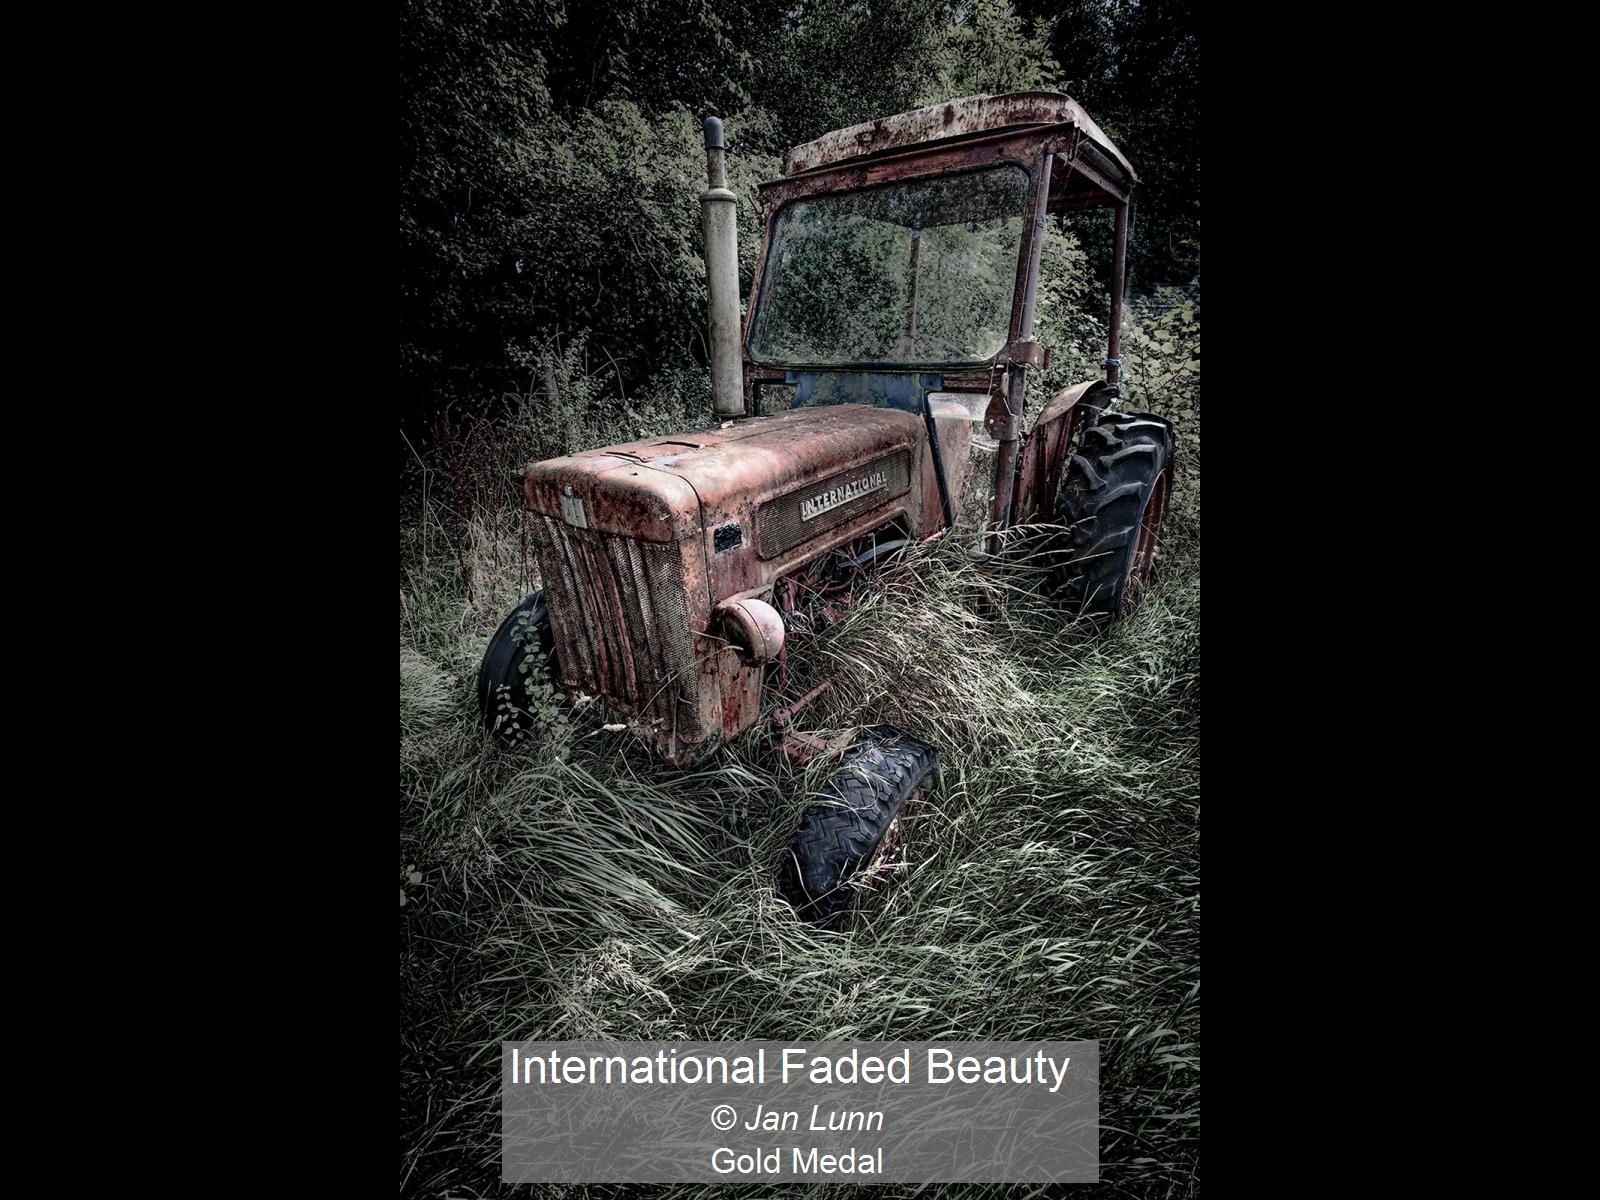 International Faded Beauty_Jan Lunn_Gold